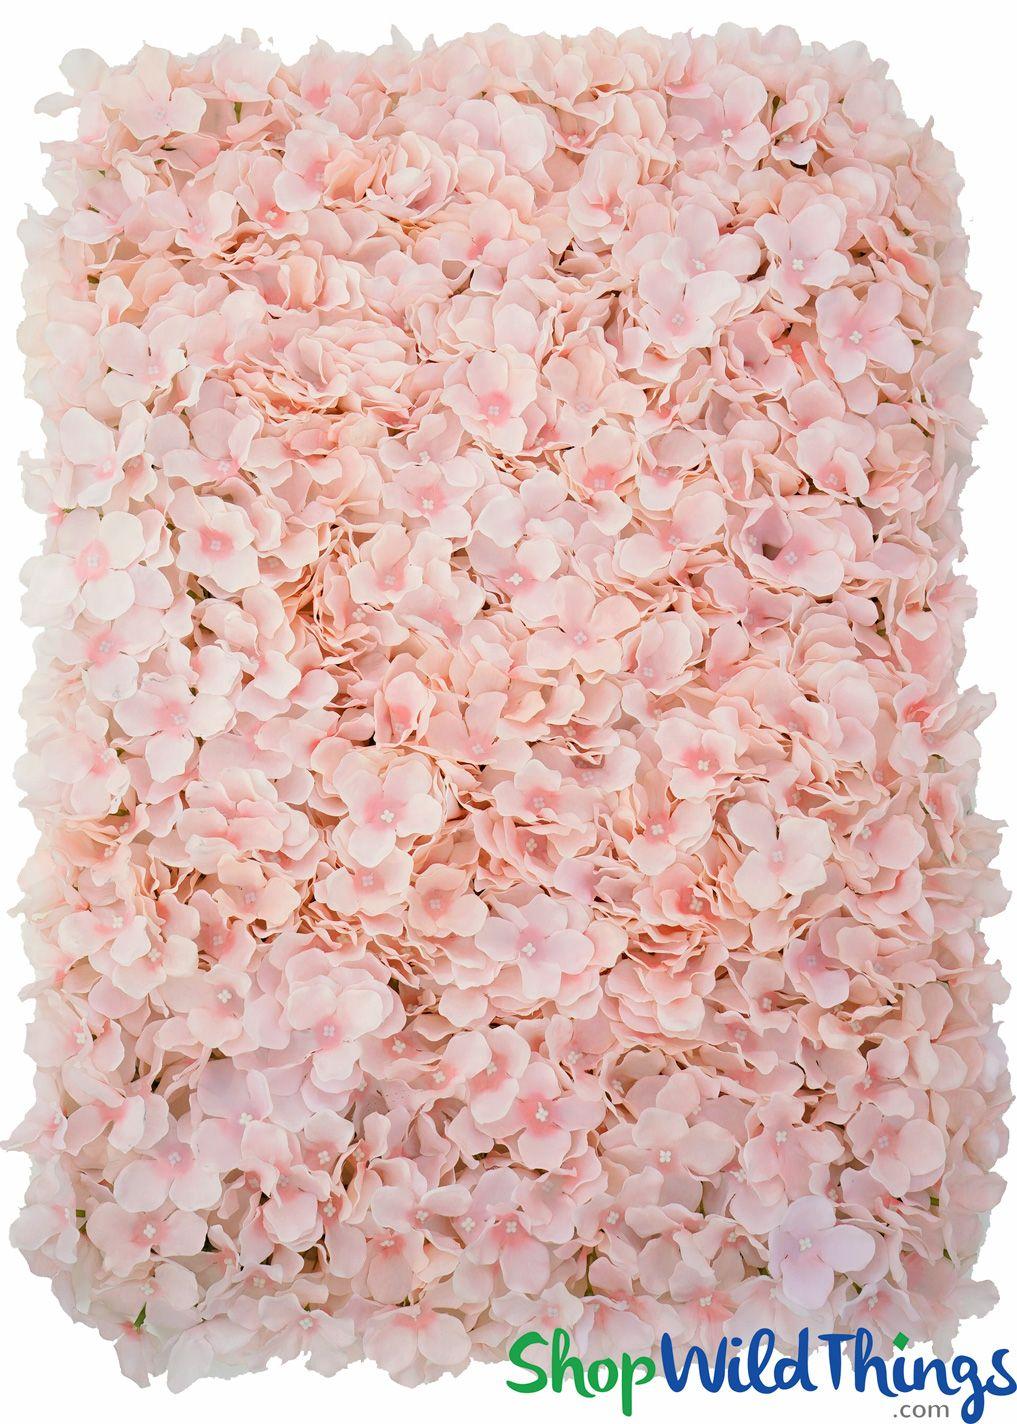 Flower Wall 19 X 26 1 2 Premium Silk Hydrangeas Coral Pink Flower Wall Backdrop Diy Pink Hydrangea Centerpieces Flower Wall